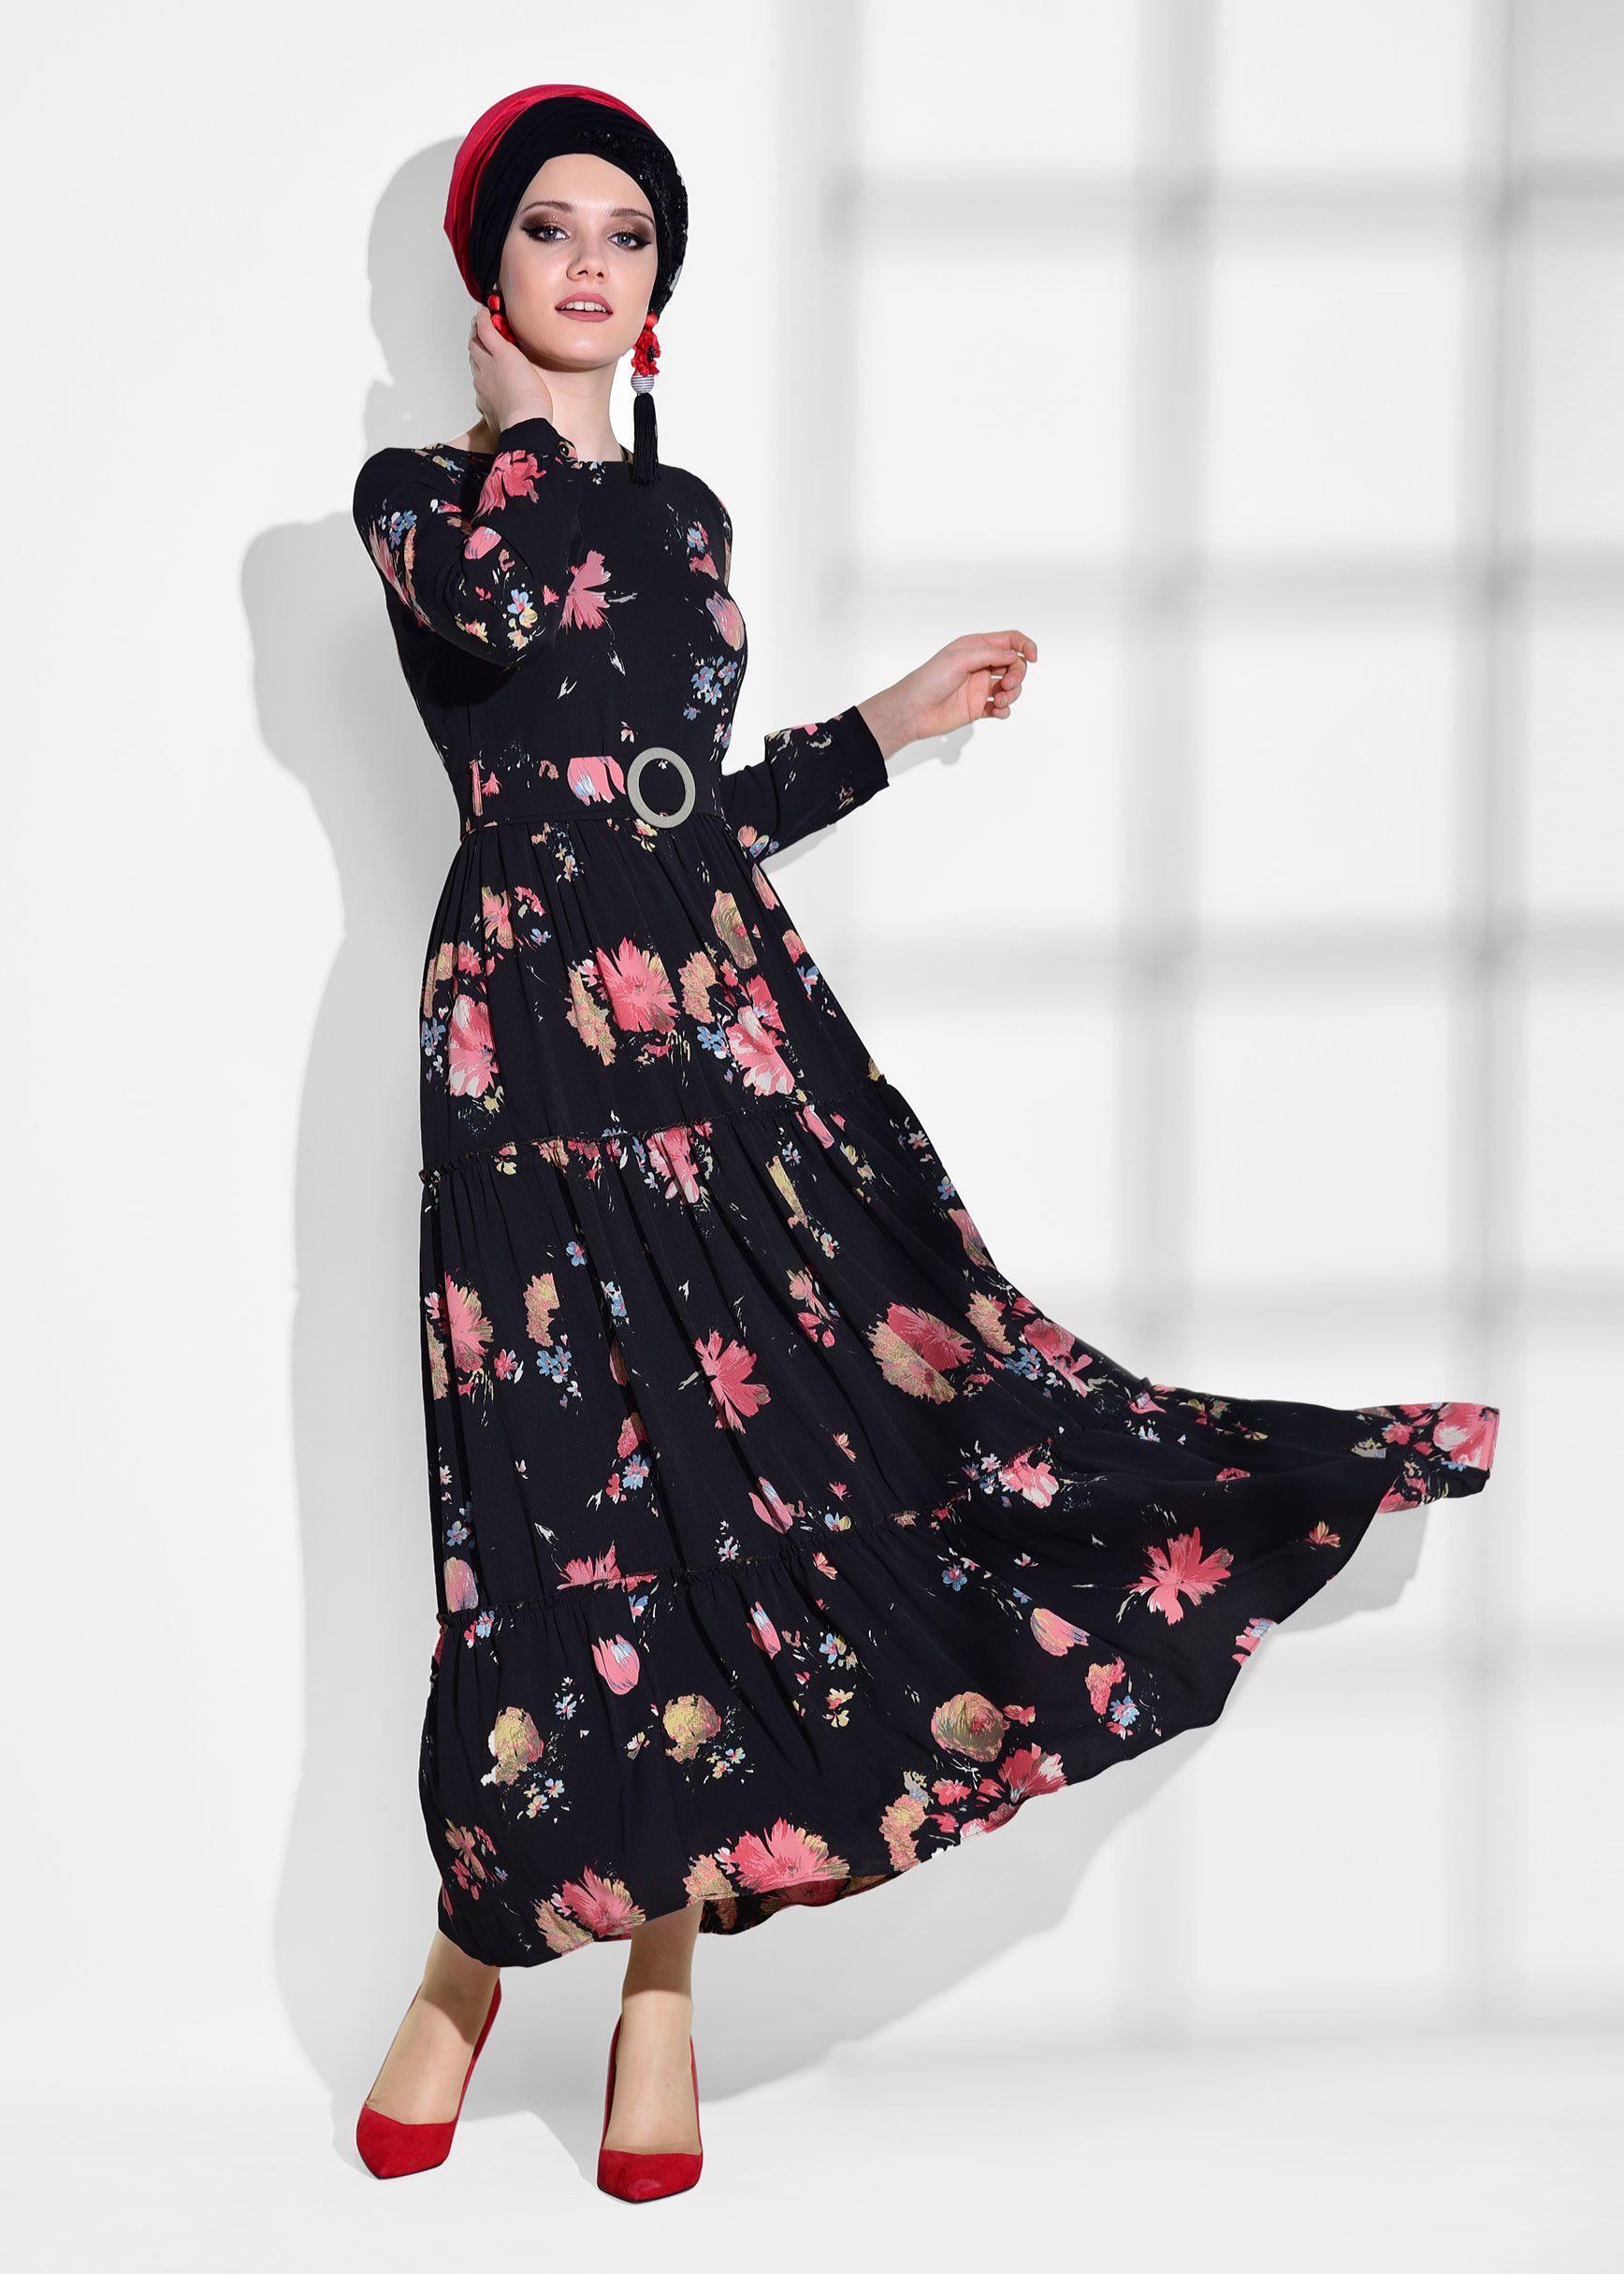 be33b45a9e563 T 7723 Mas-Çiçek Desenli Elbise - PUDRA - Trend Tesettür | tr ...